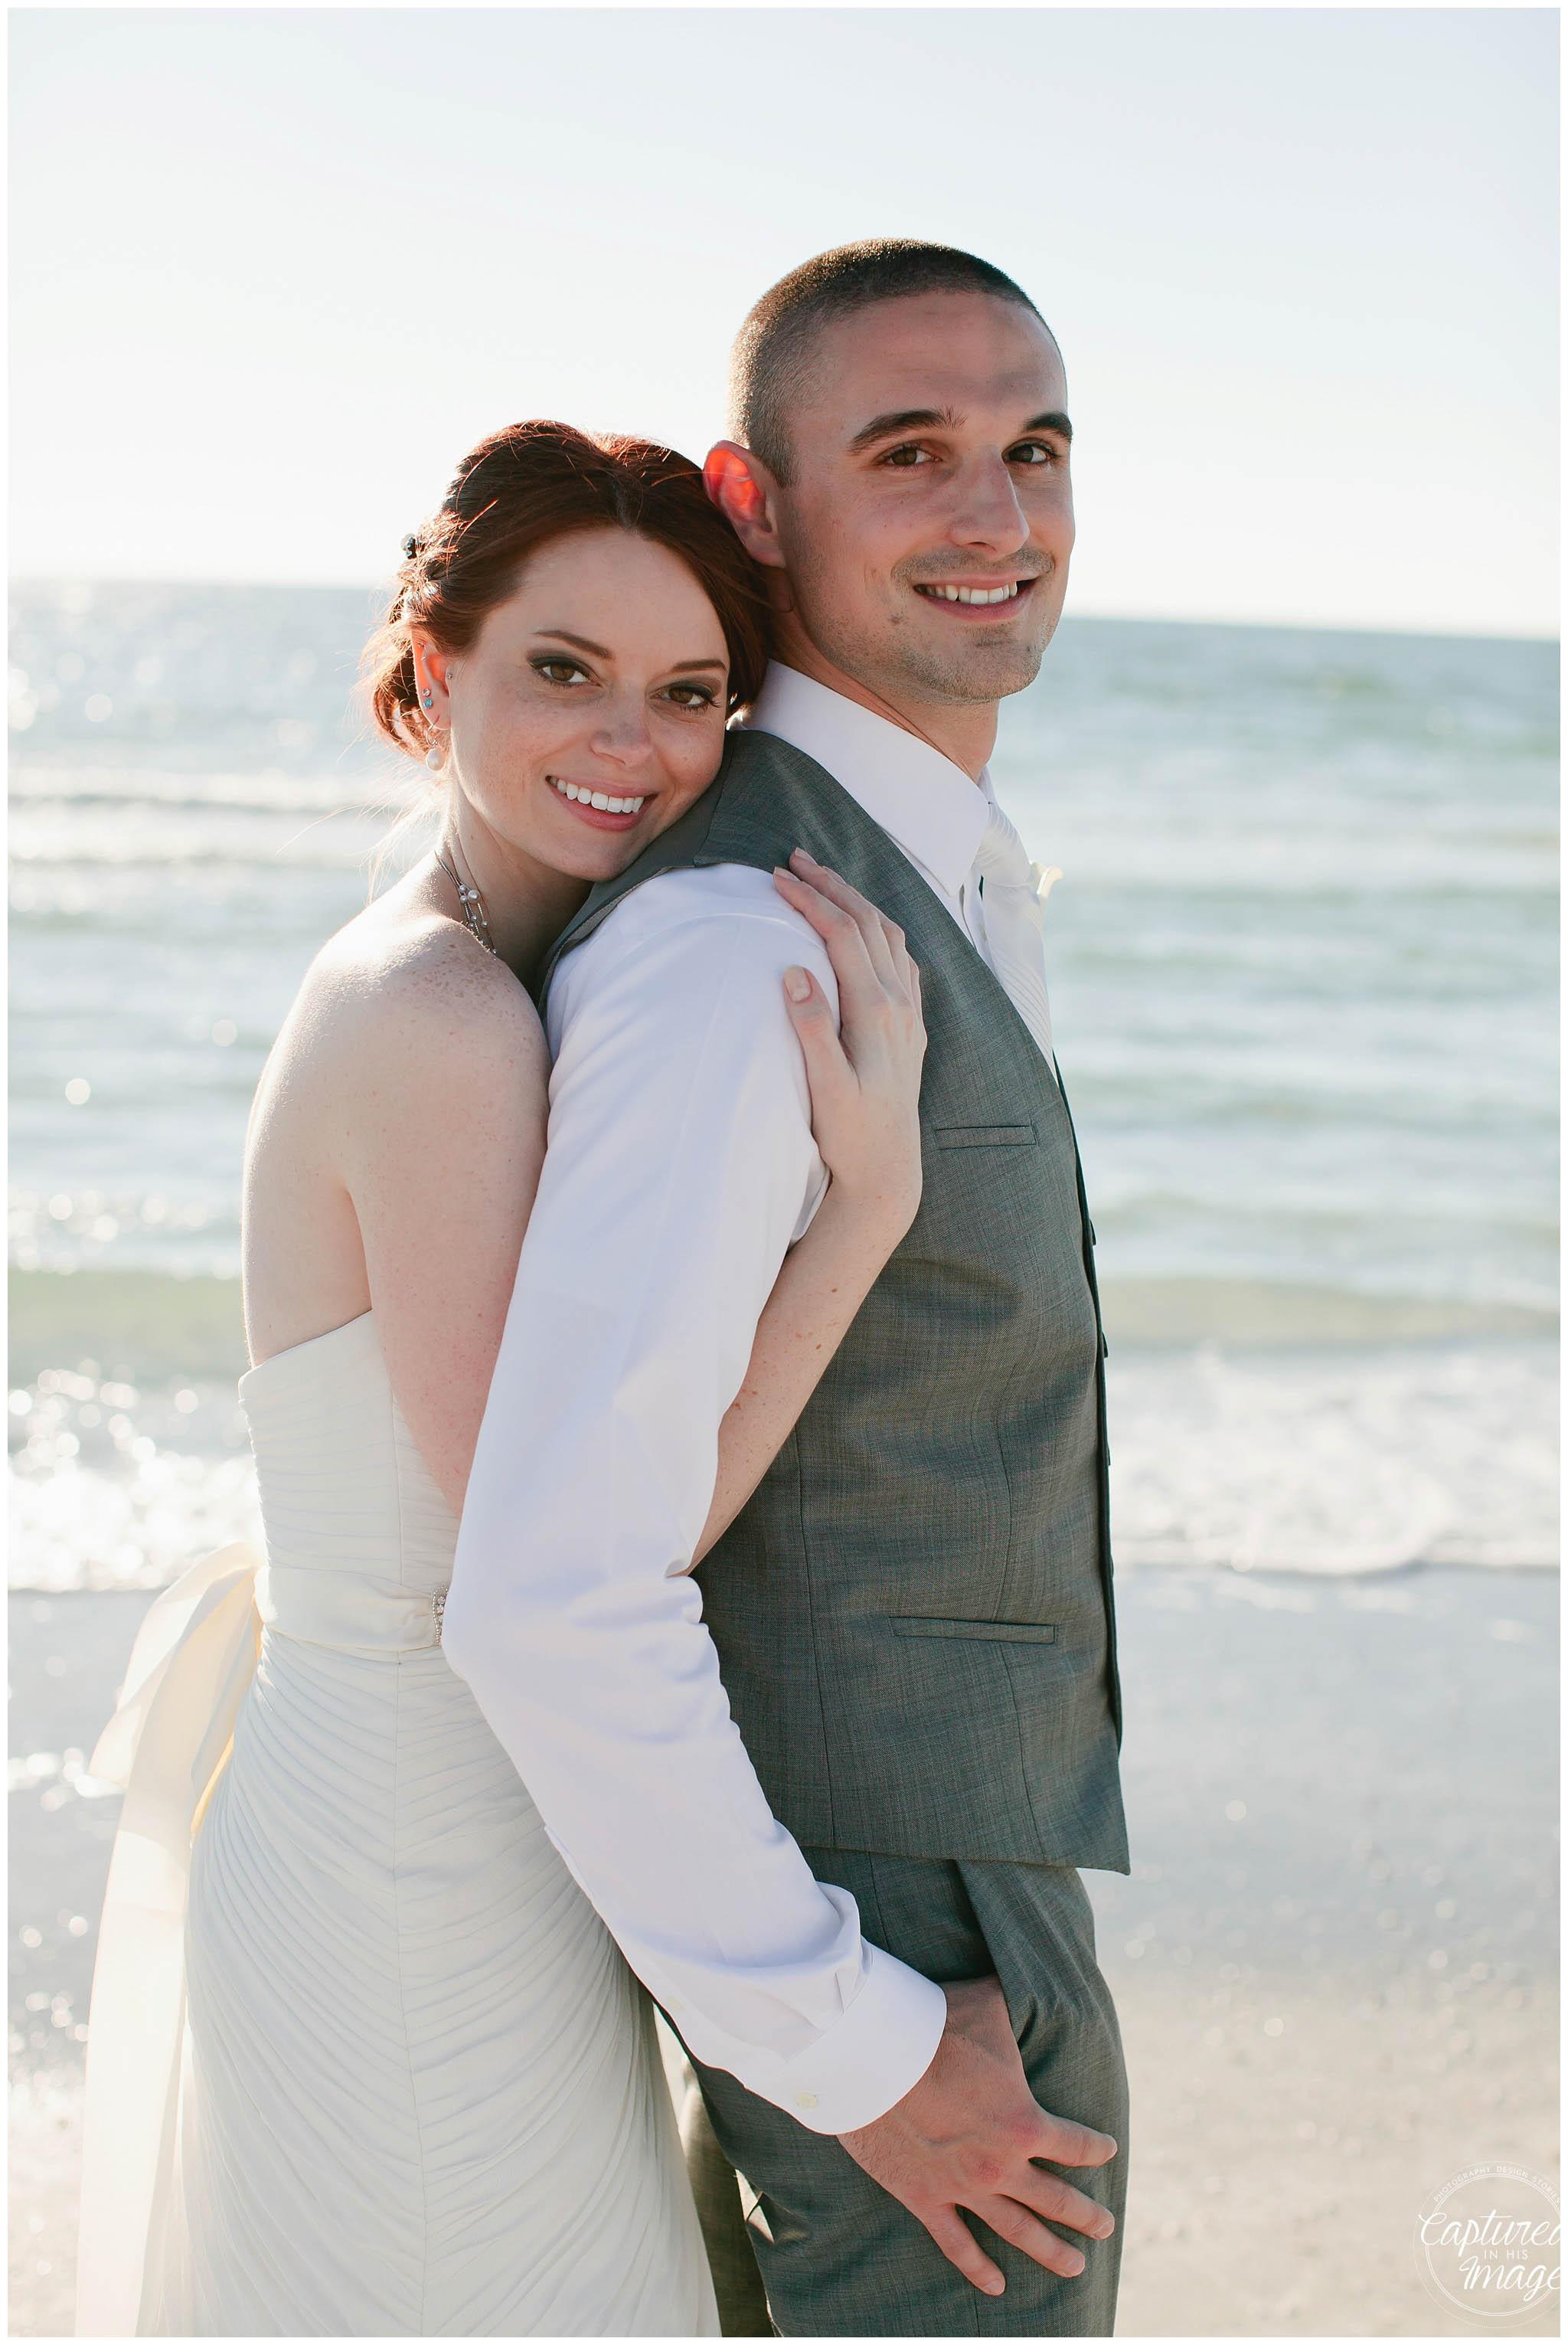 St. Pete Beach Destination Wedding (26 of 81)